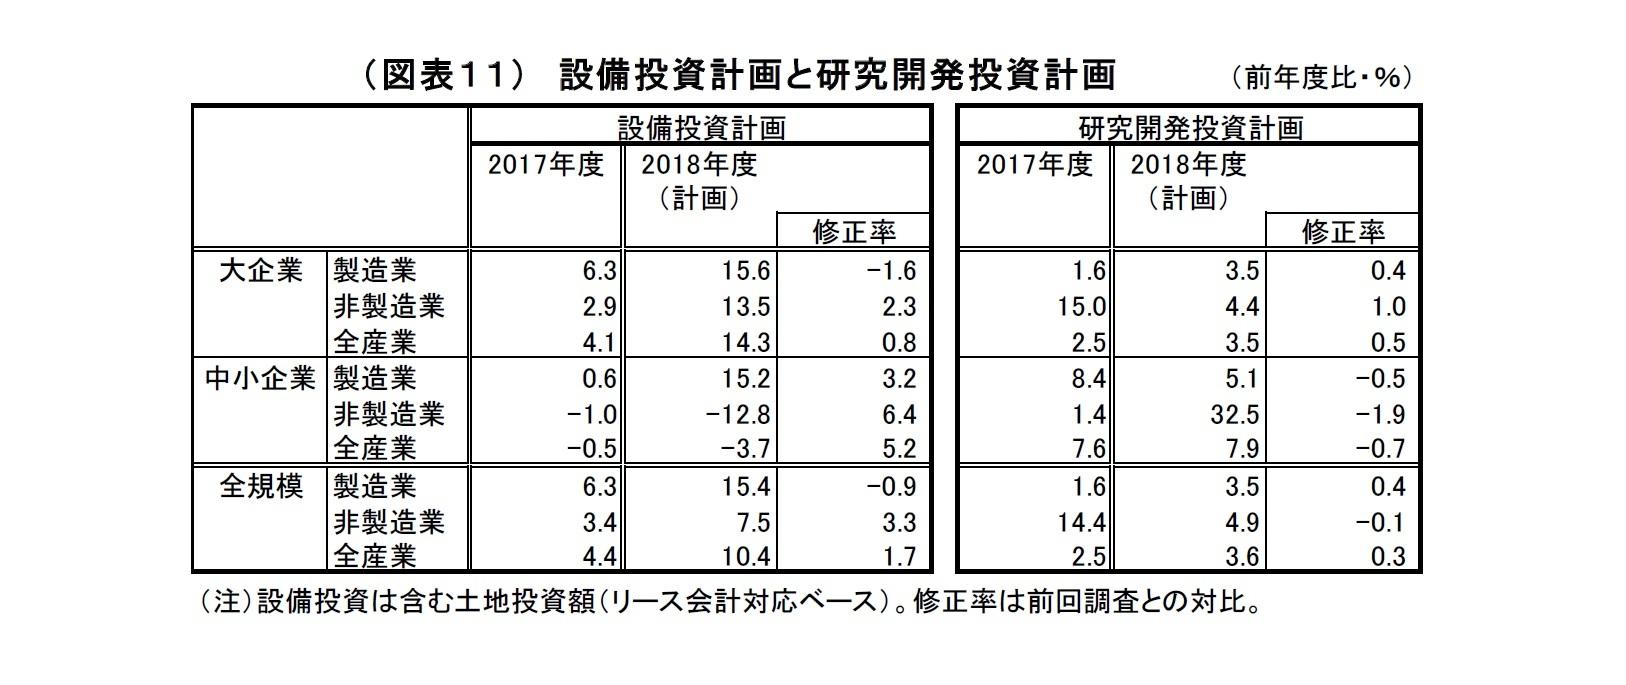 (図表11)設備投資計画と研究開発投資計